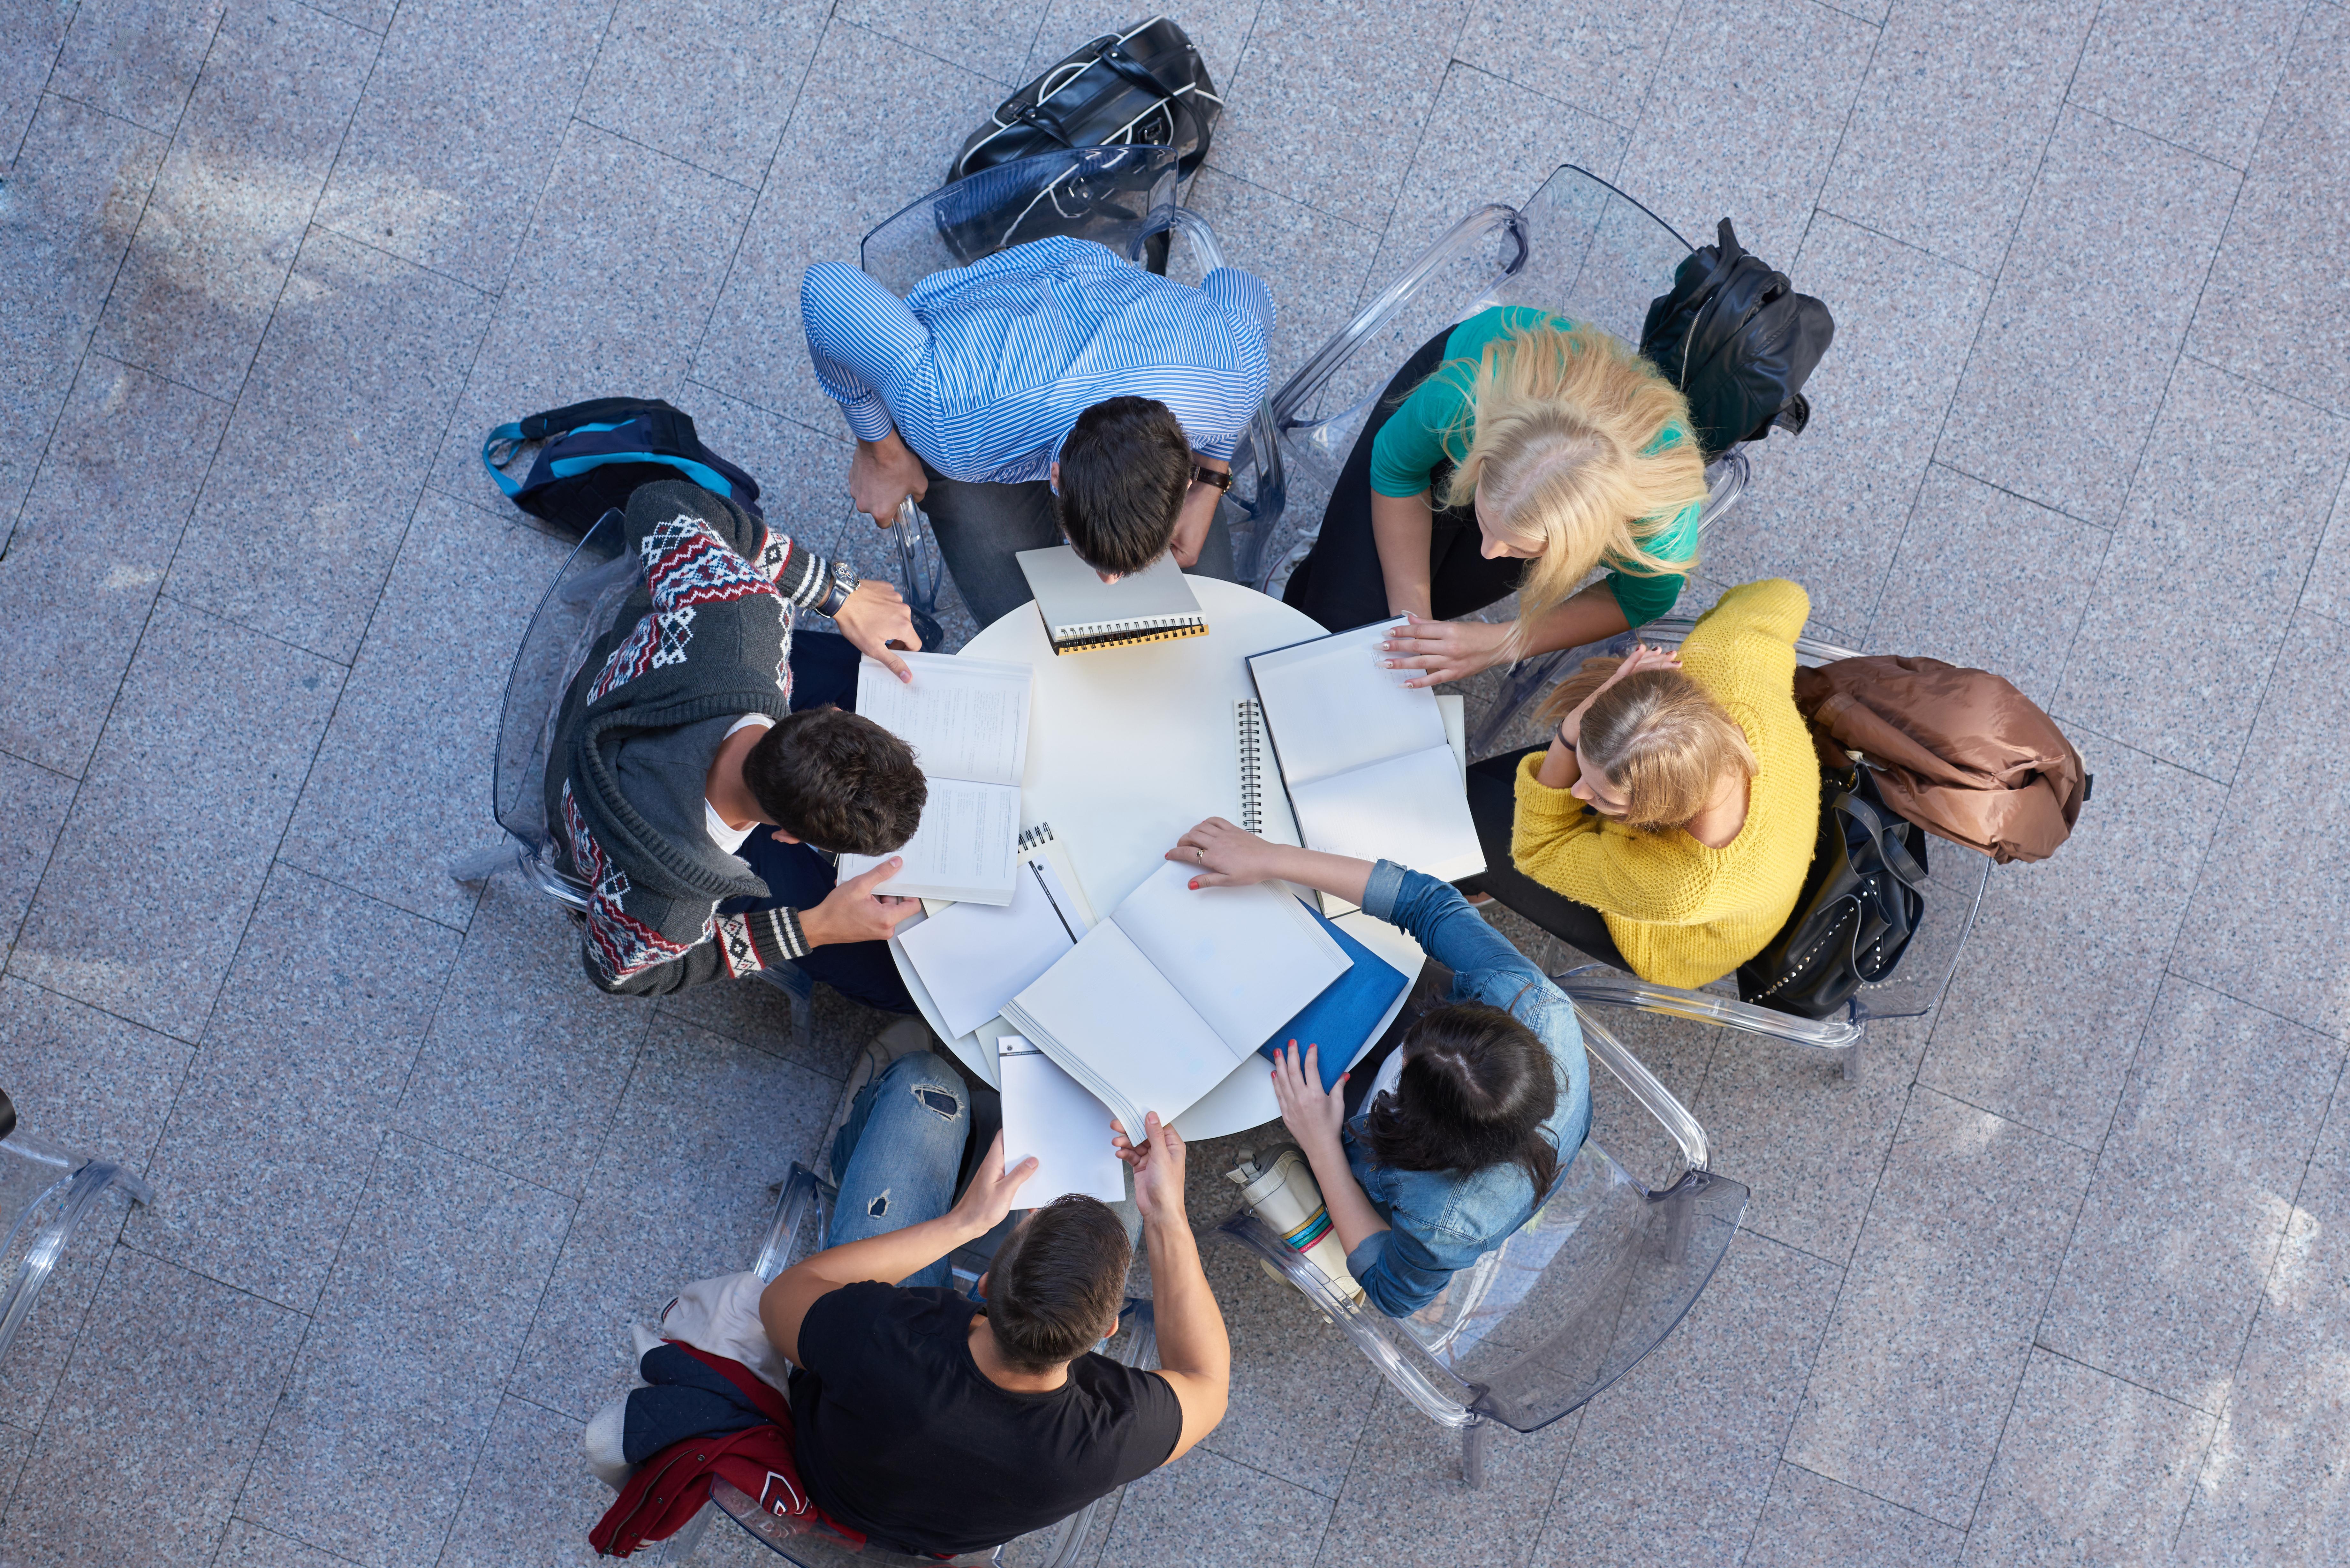 beginner bloggers recommending blogging courses